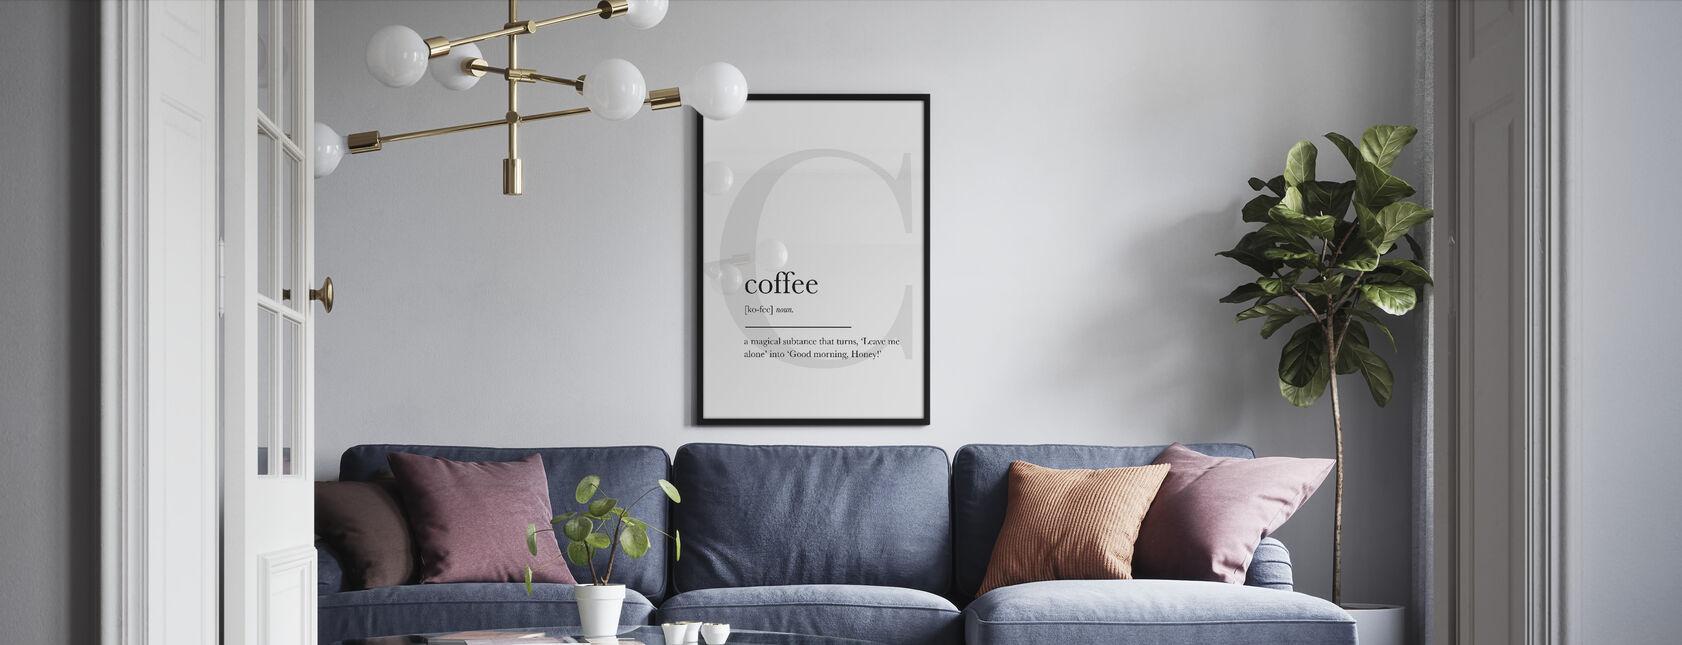 Coffee - Framed print - Living Room